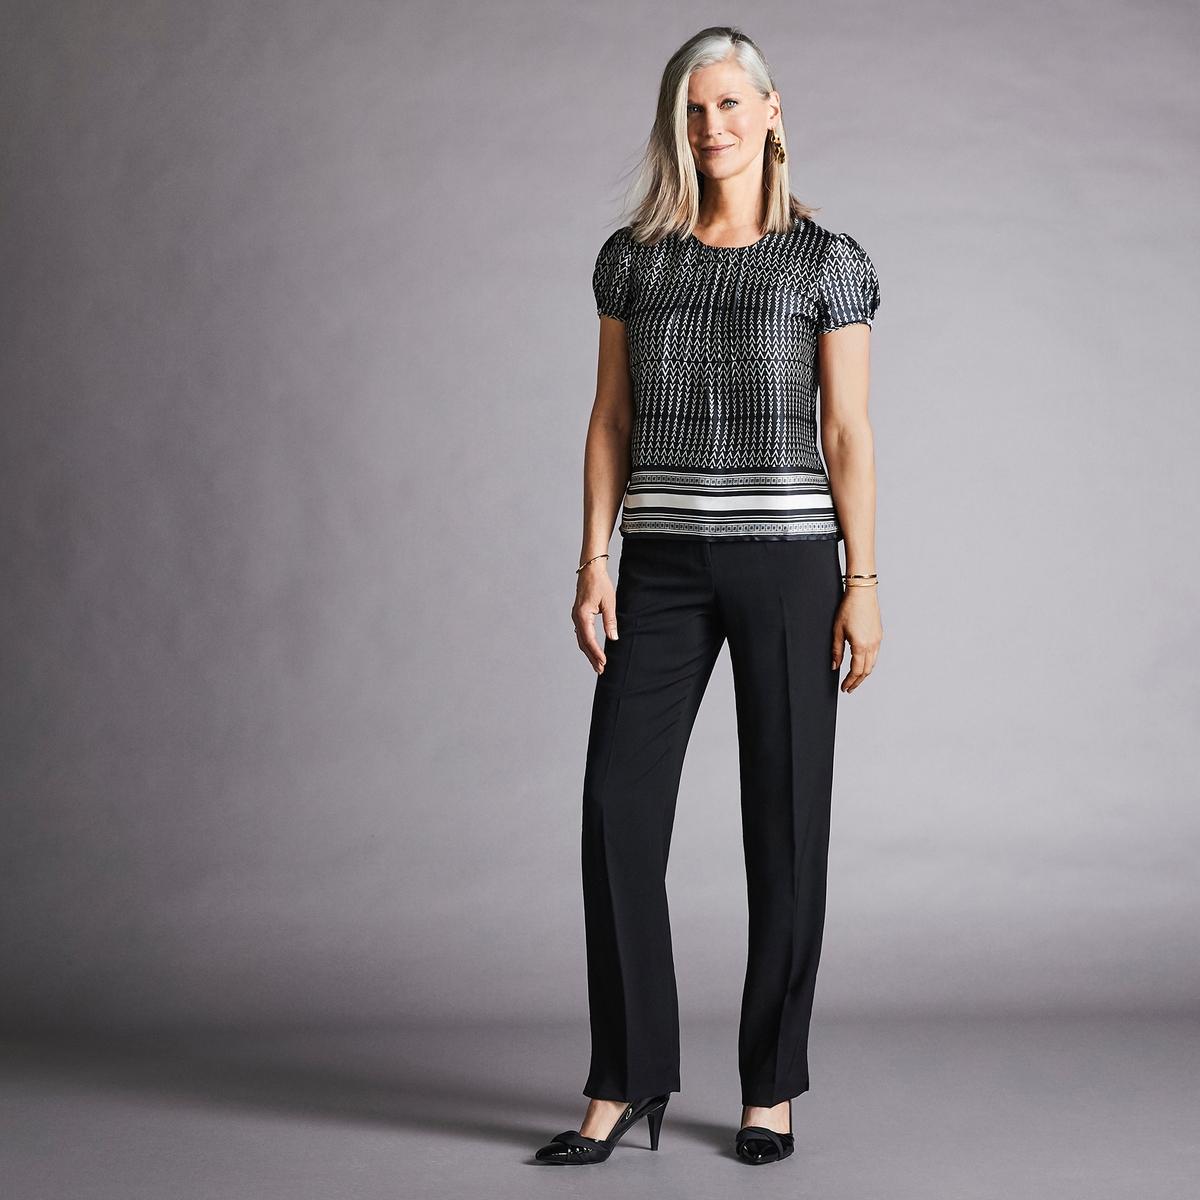 Imagen adicional de producto de Pantalón urbano recto de sarga vaporosa - Anne weyburn